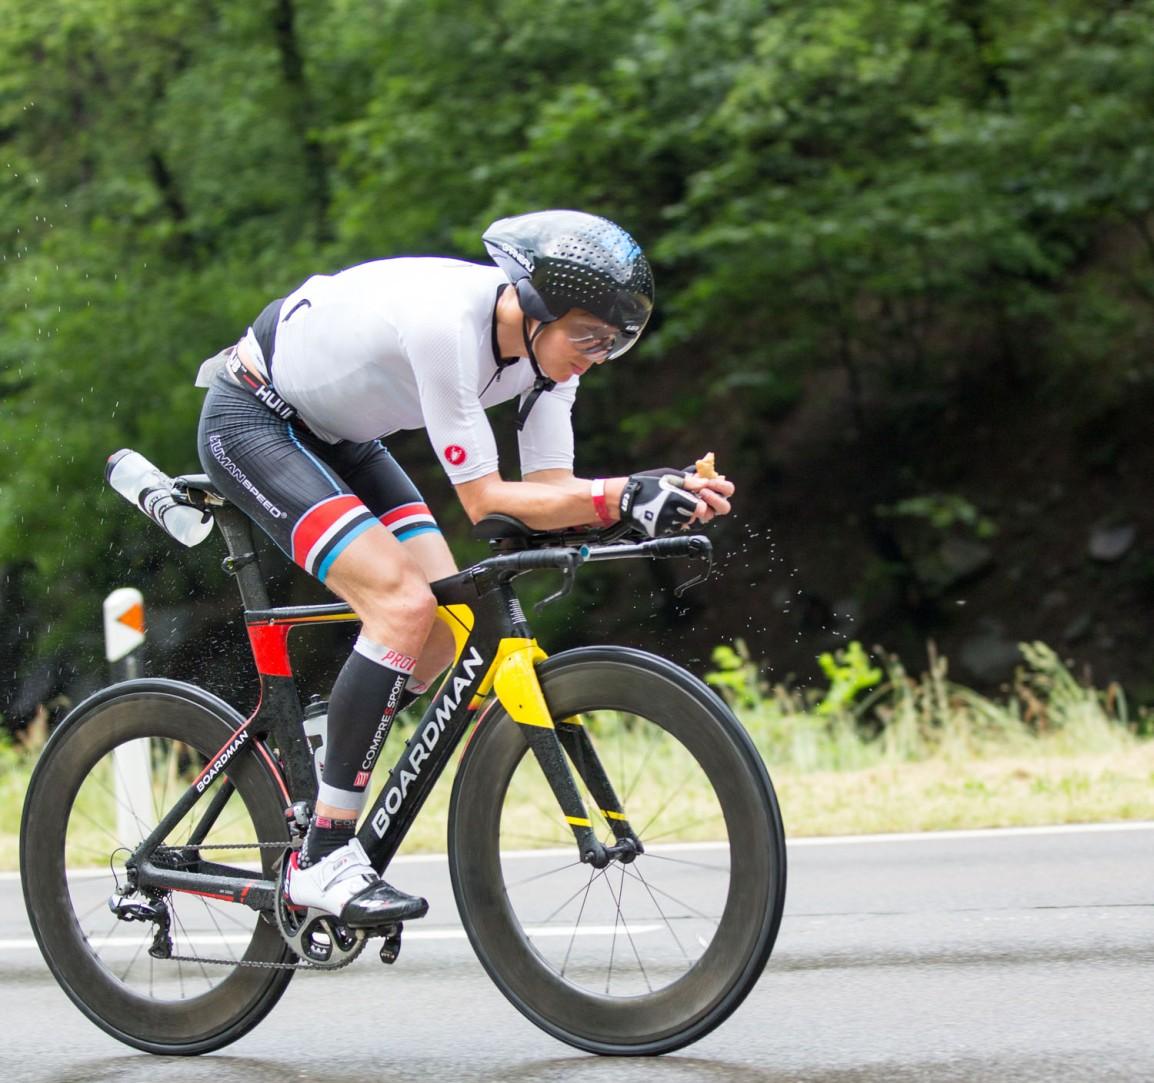 Swissman Xtreme triathlon - Triallan - Allan Hovda - Boardman TTE - Castelli Gabba - Swiss Alps